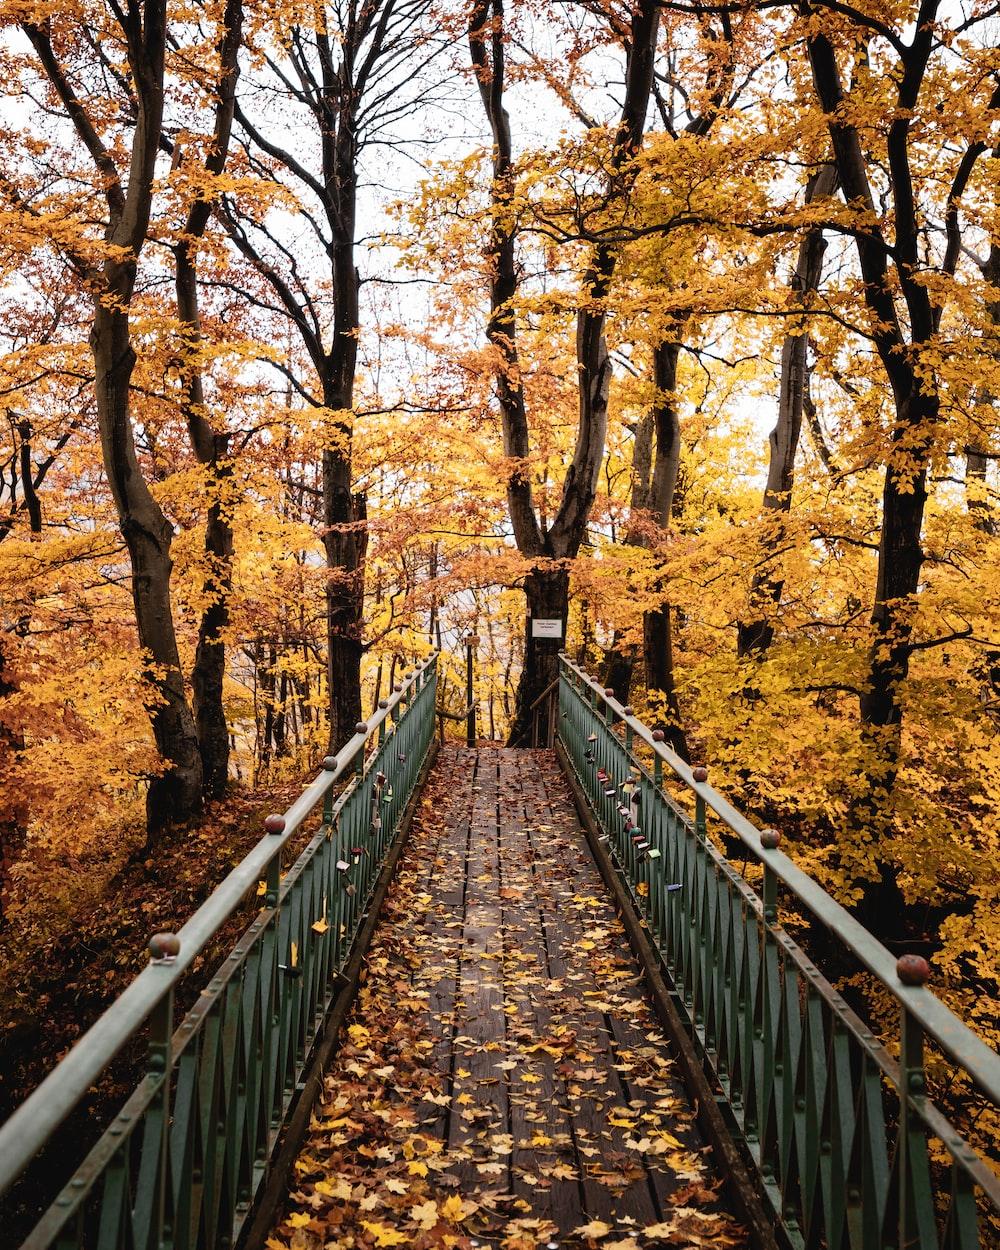 brown wooden bridge in between brown trees during daytime